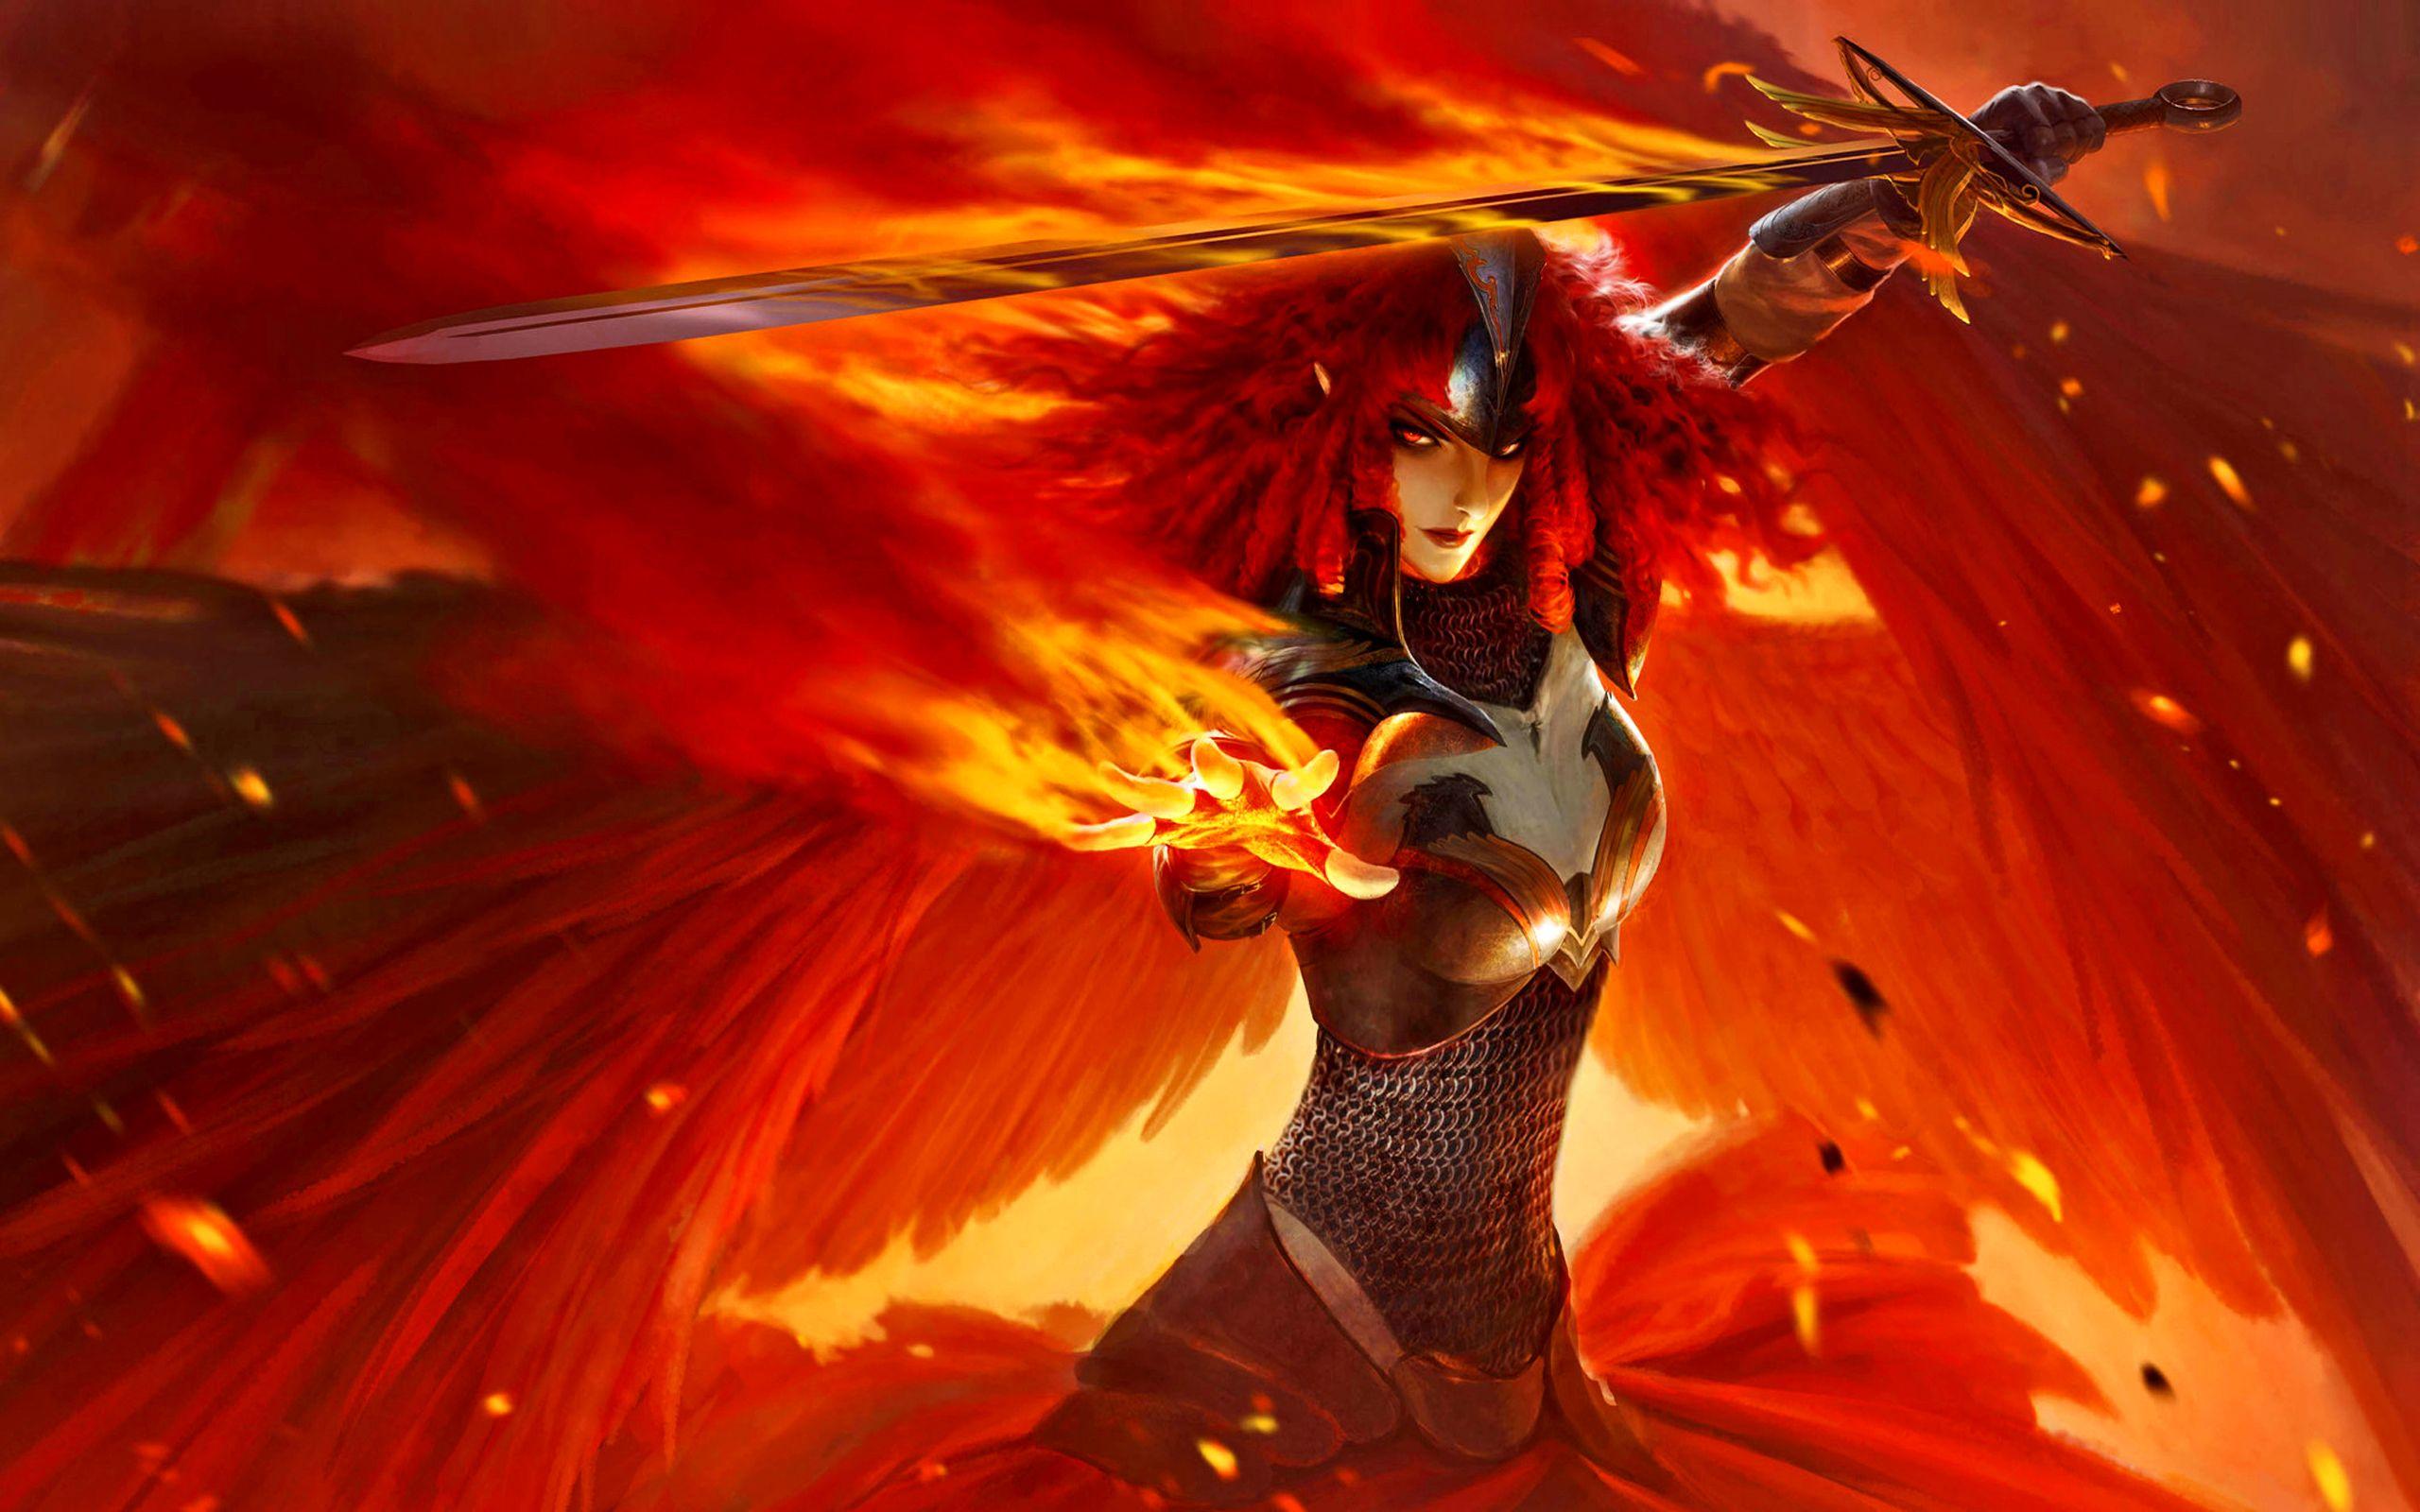 Pin By Taft Ashcraft On Fantasy Characters Angel Warrior Fantasy Art Women Warriors Wallpaper